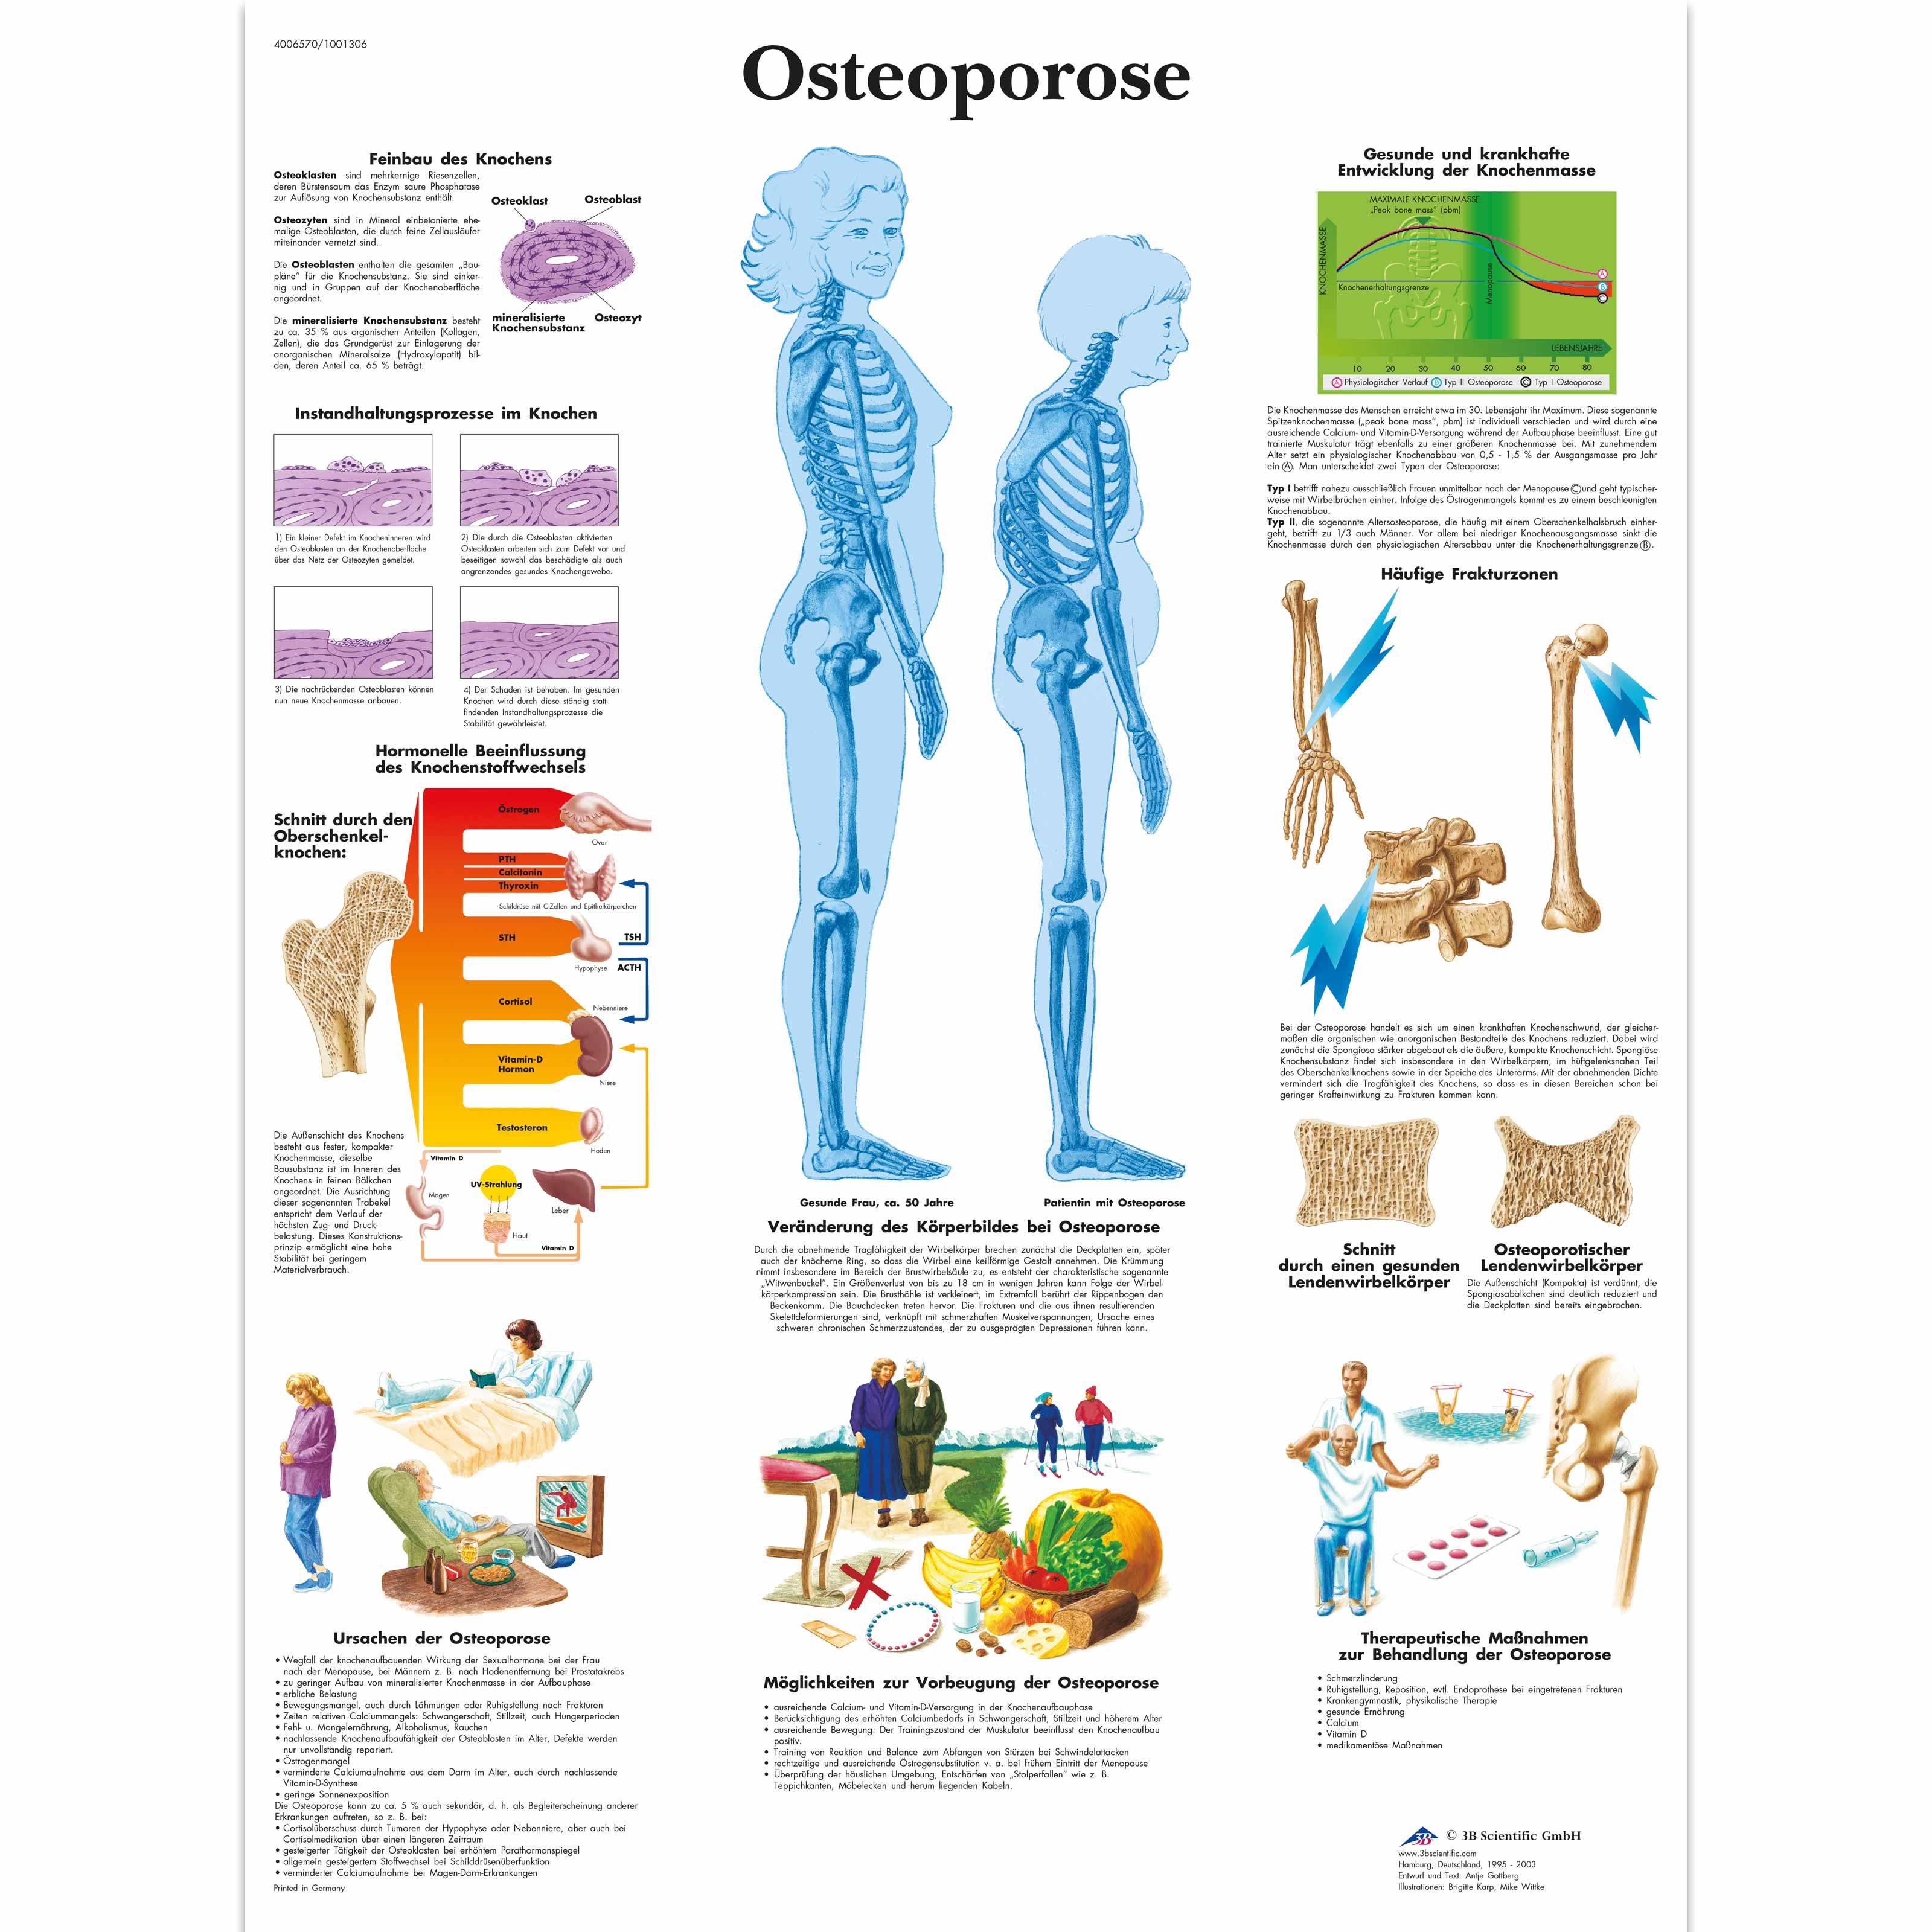 Osteoporose Chart - 1001306 - 3B Scientific - VR0121L - Arthritis ...